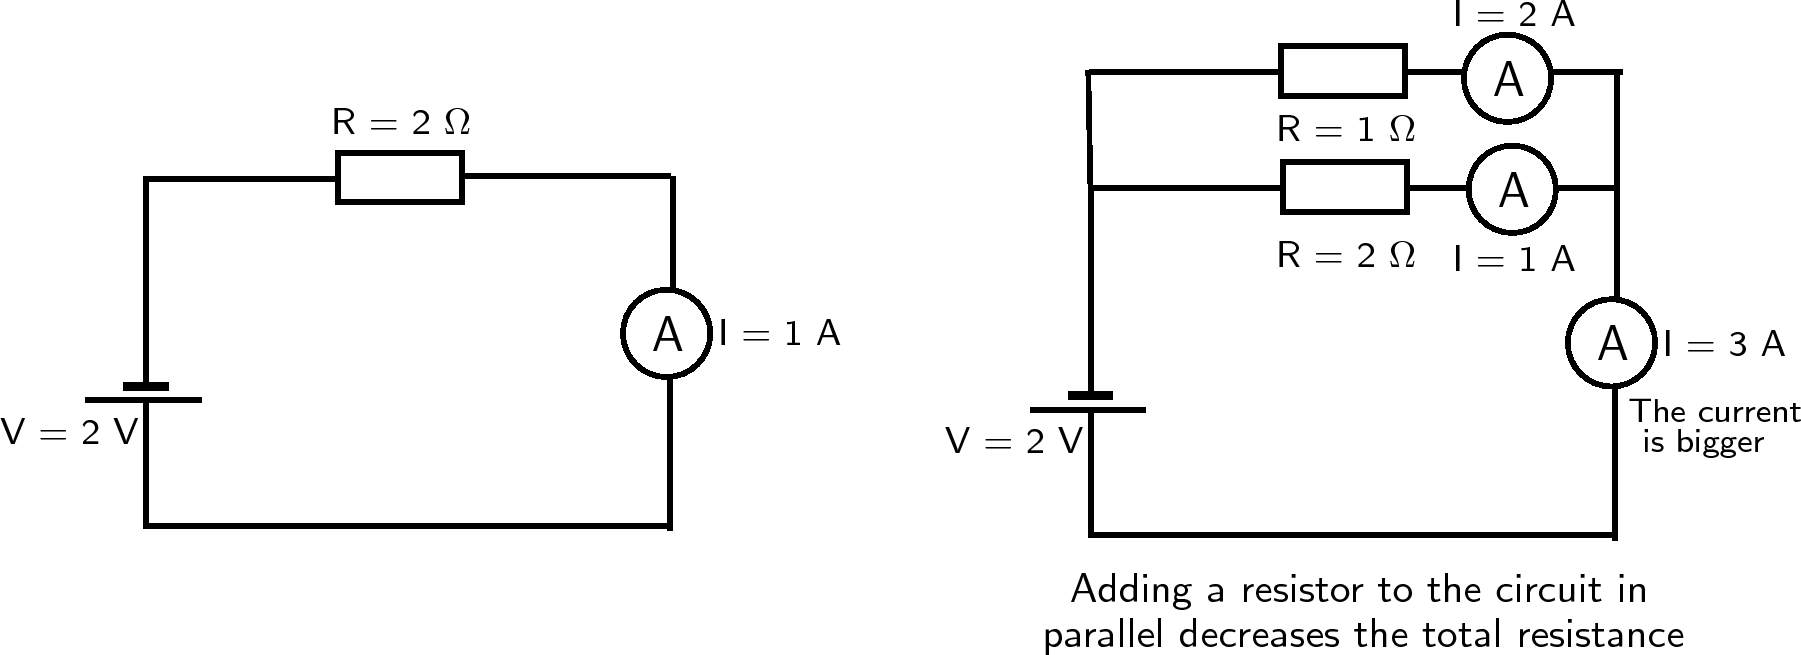 Resistors In Parallel Decrease Resistance